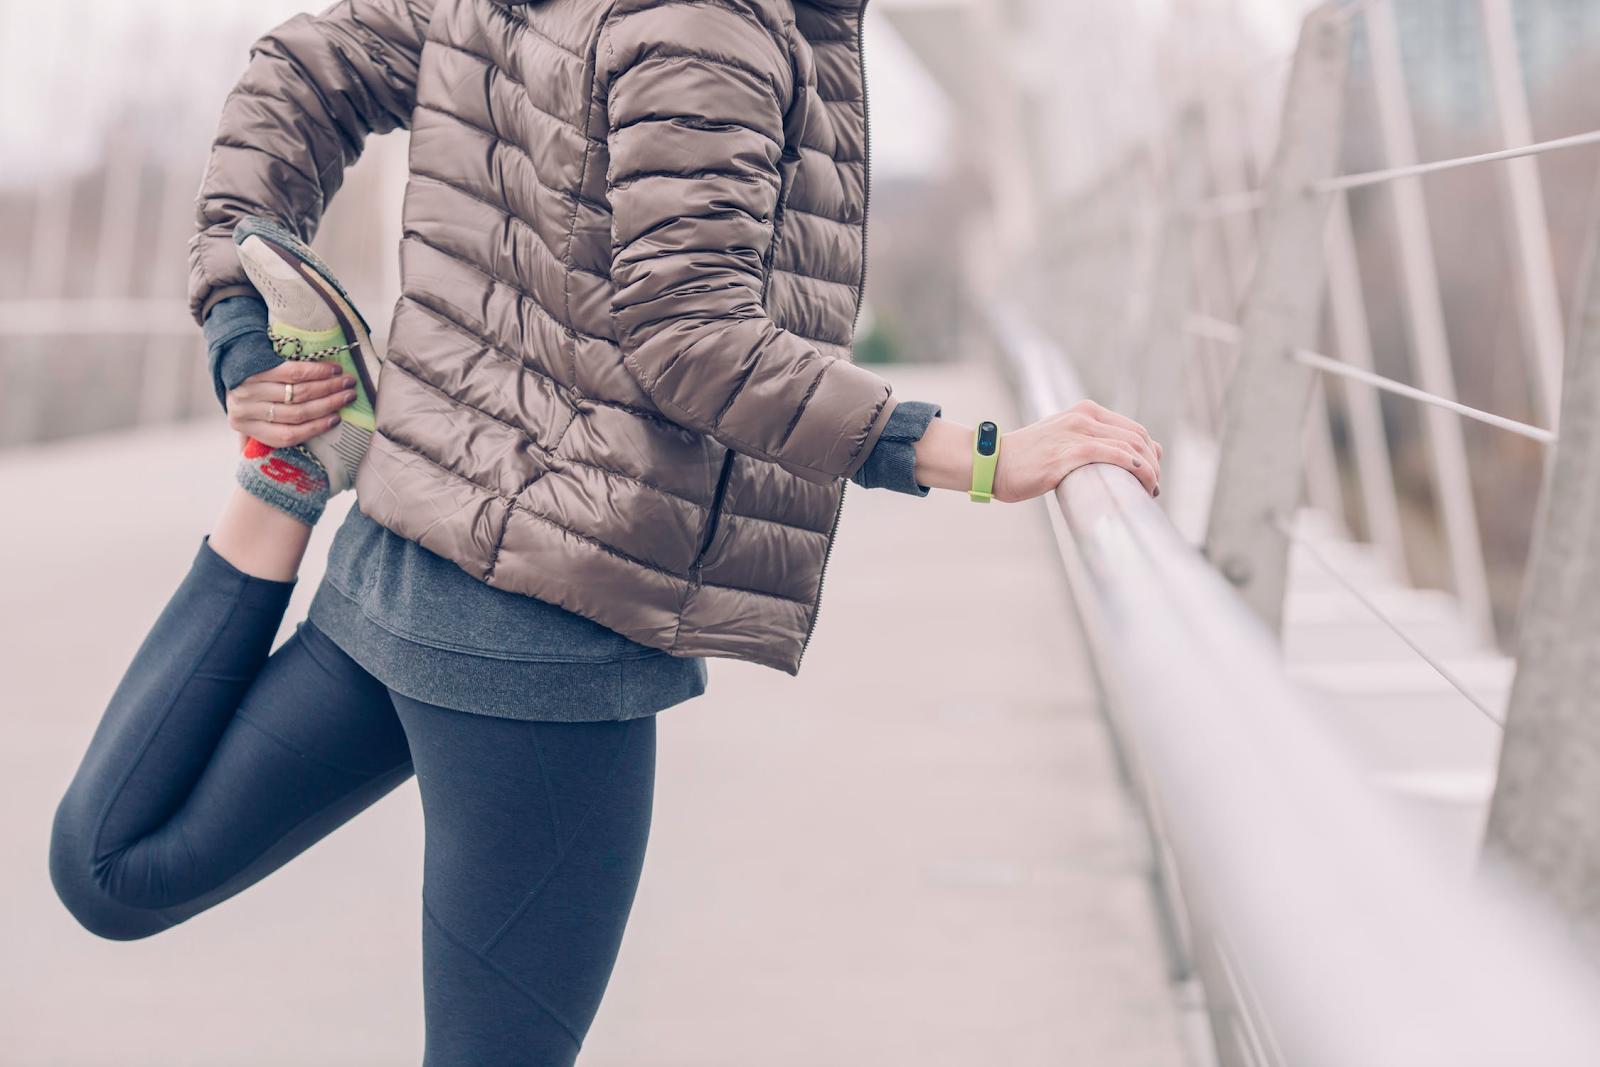 Runner stretching on a bridge in winter gear